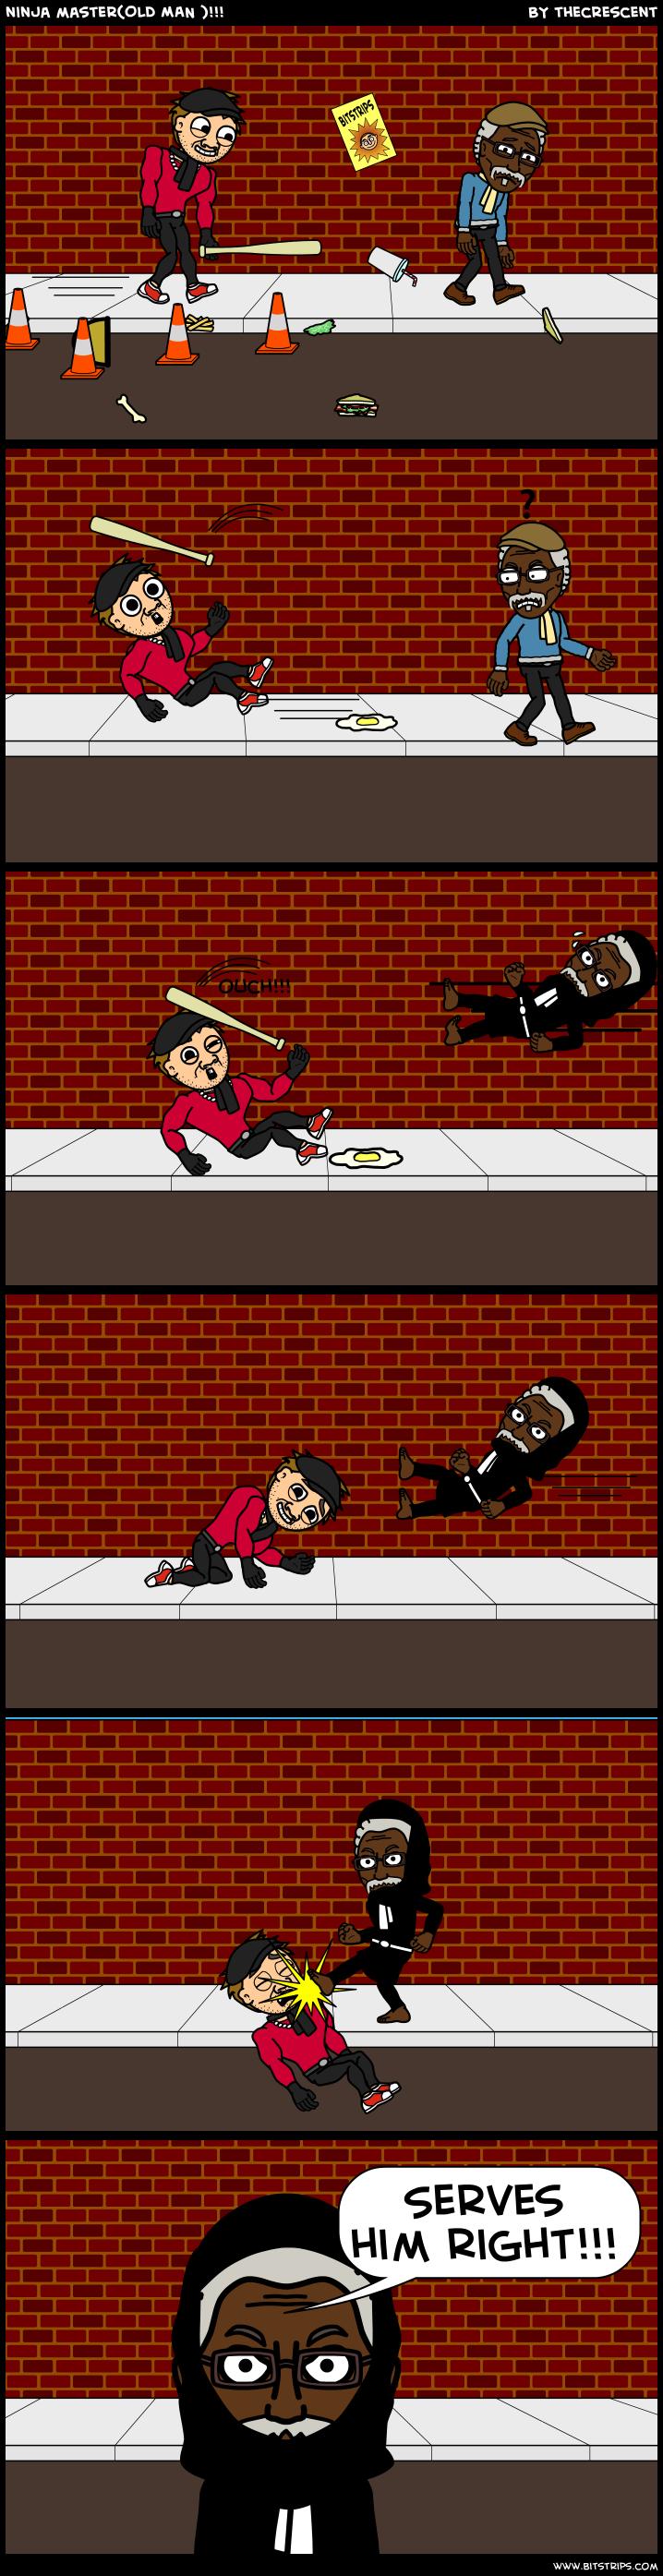 ninja master(OLD MAN )!!!